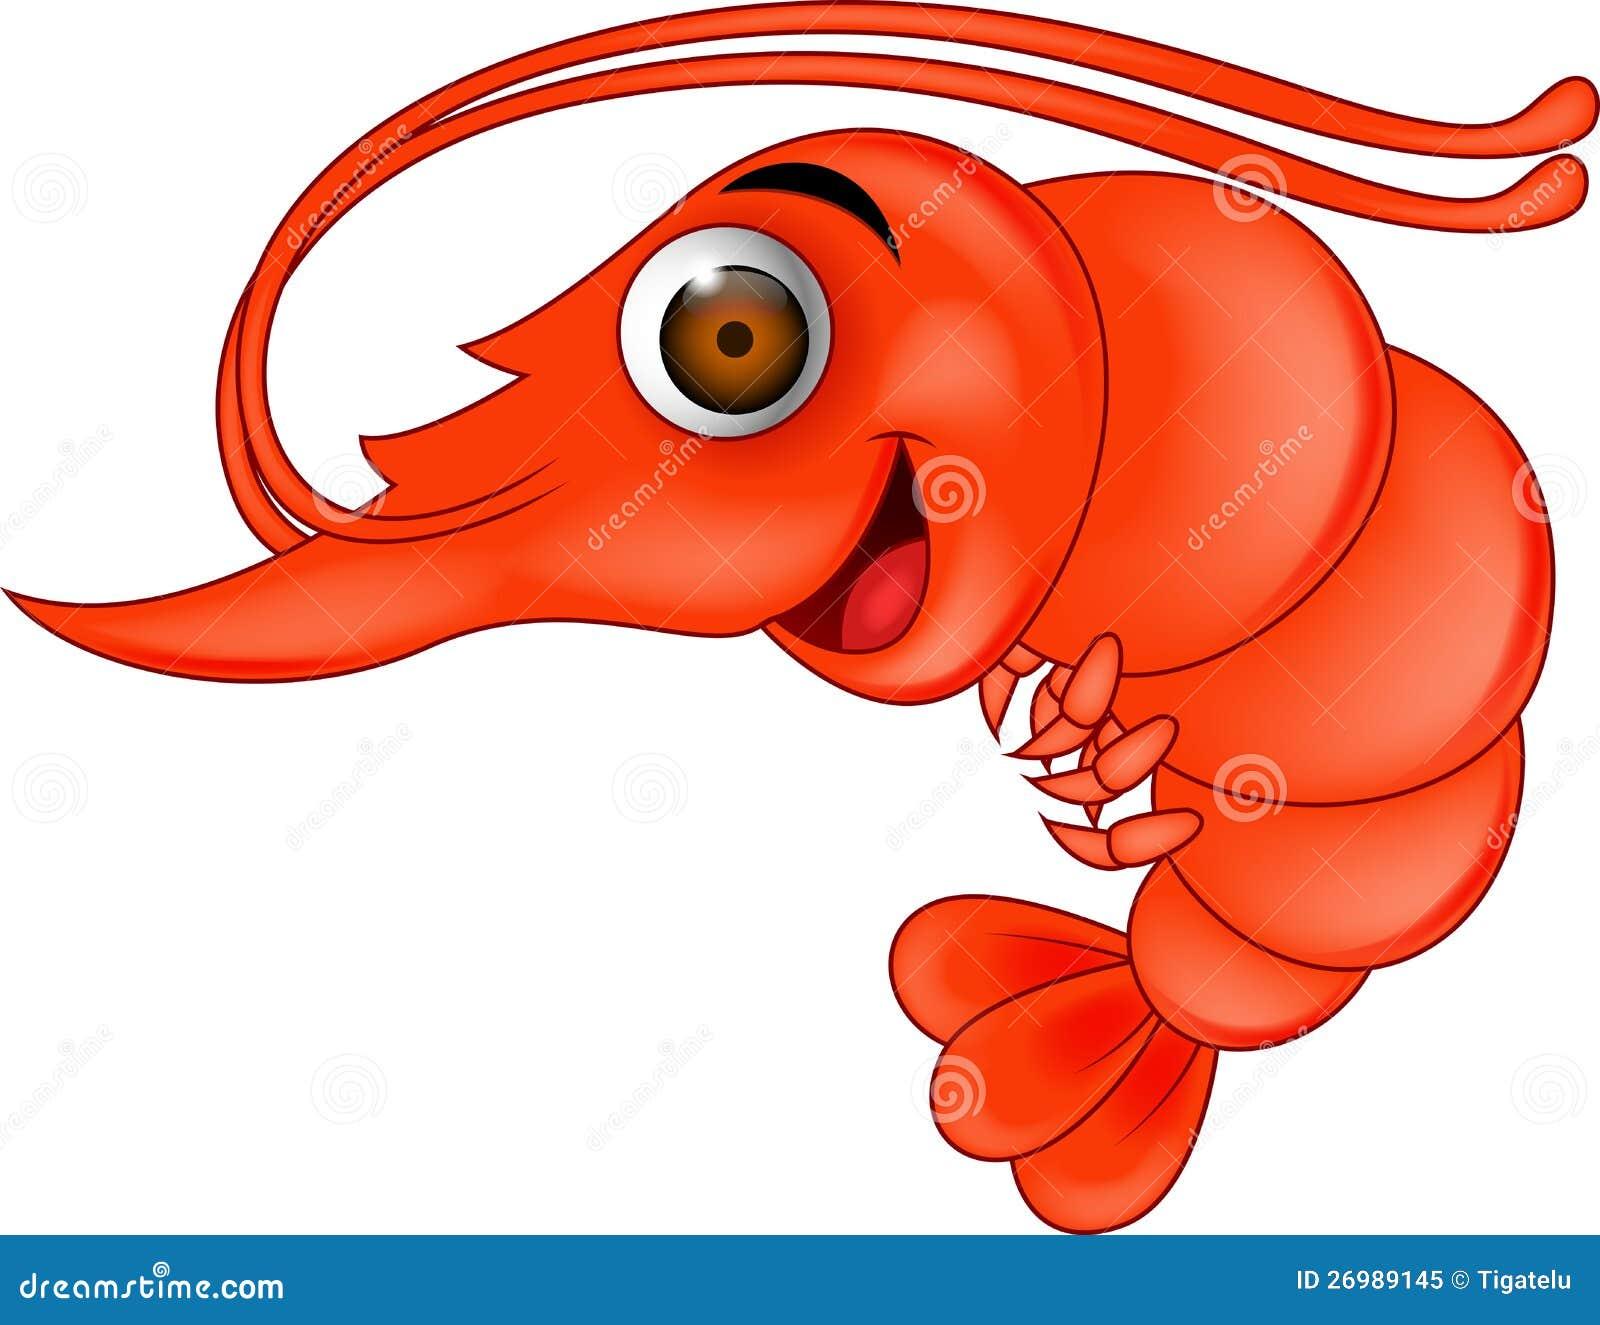 prawn cartoon stock vector illustration of gourmet shrimp clip art png shrimp clip art images black white